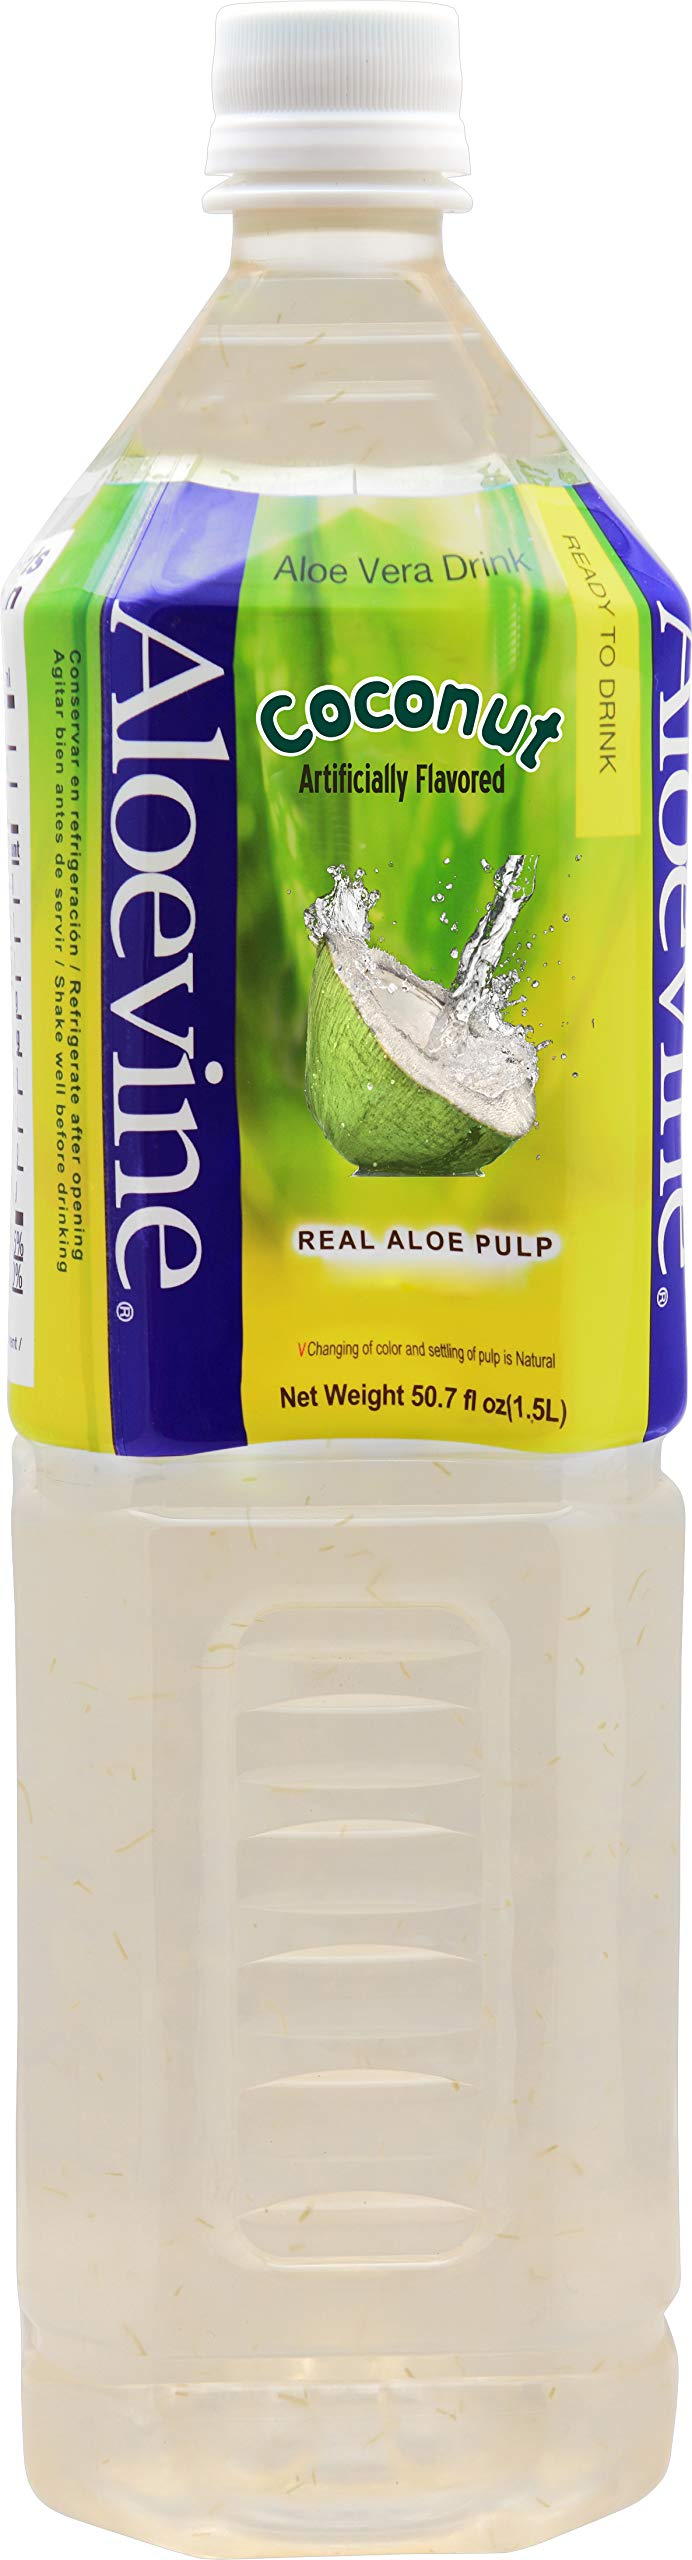 ALOEVINE Aloe Vera Drink 50.7 oz. 6 Pack (Coconut)